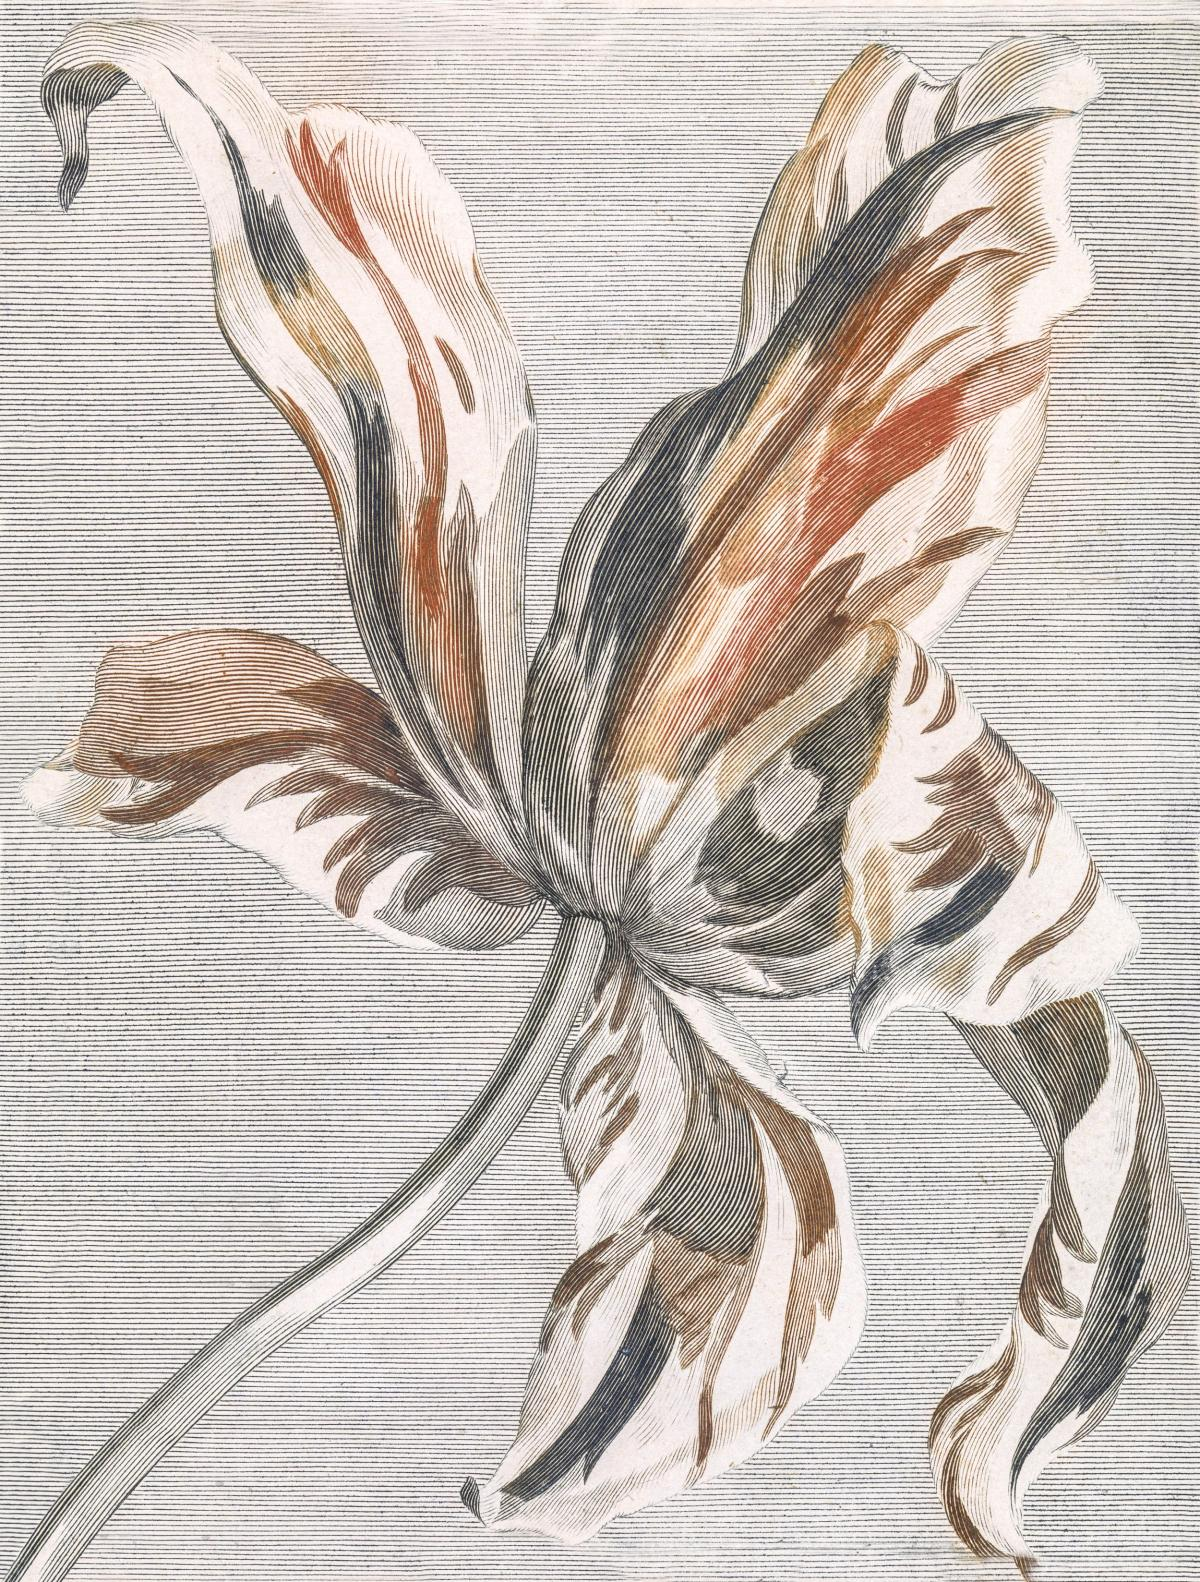 Tulip by Johan Teyler (1648-1709). Original from The Rijksmuseum.